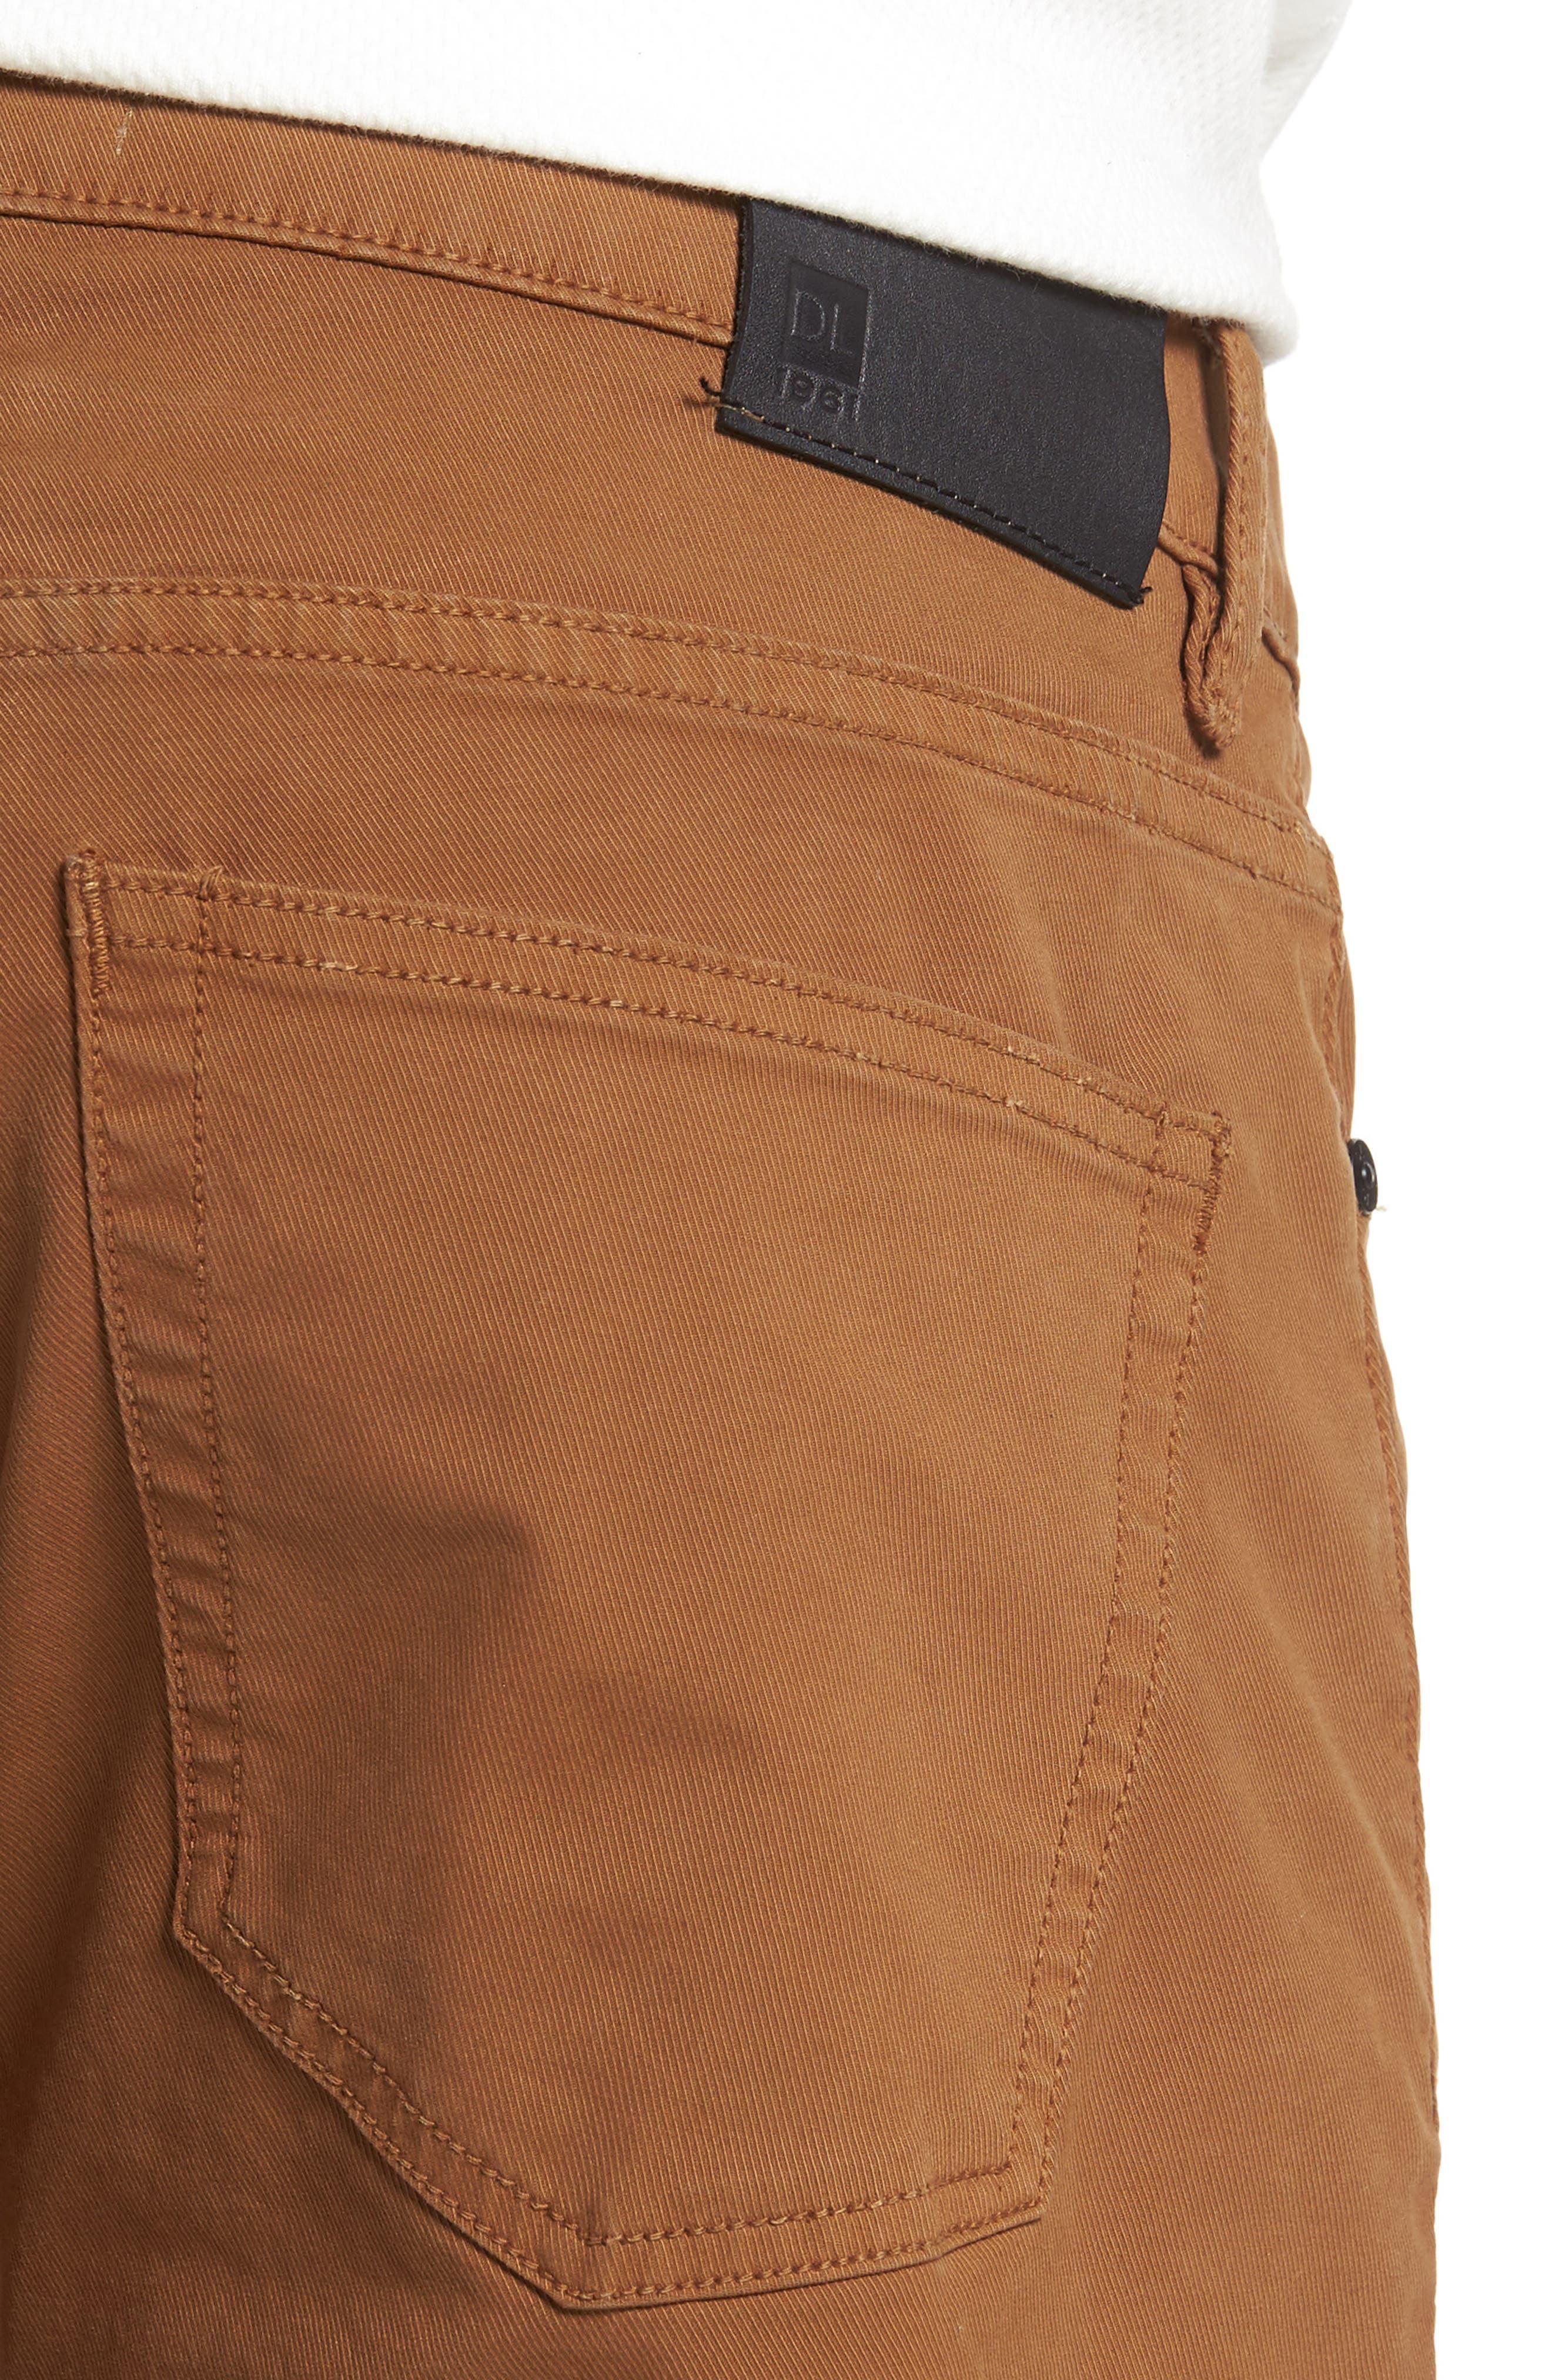 Nick Slim Fit Flat Front Pants,                             Alternate thumbnail 4, color,                             Sienna